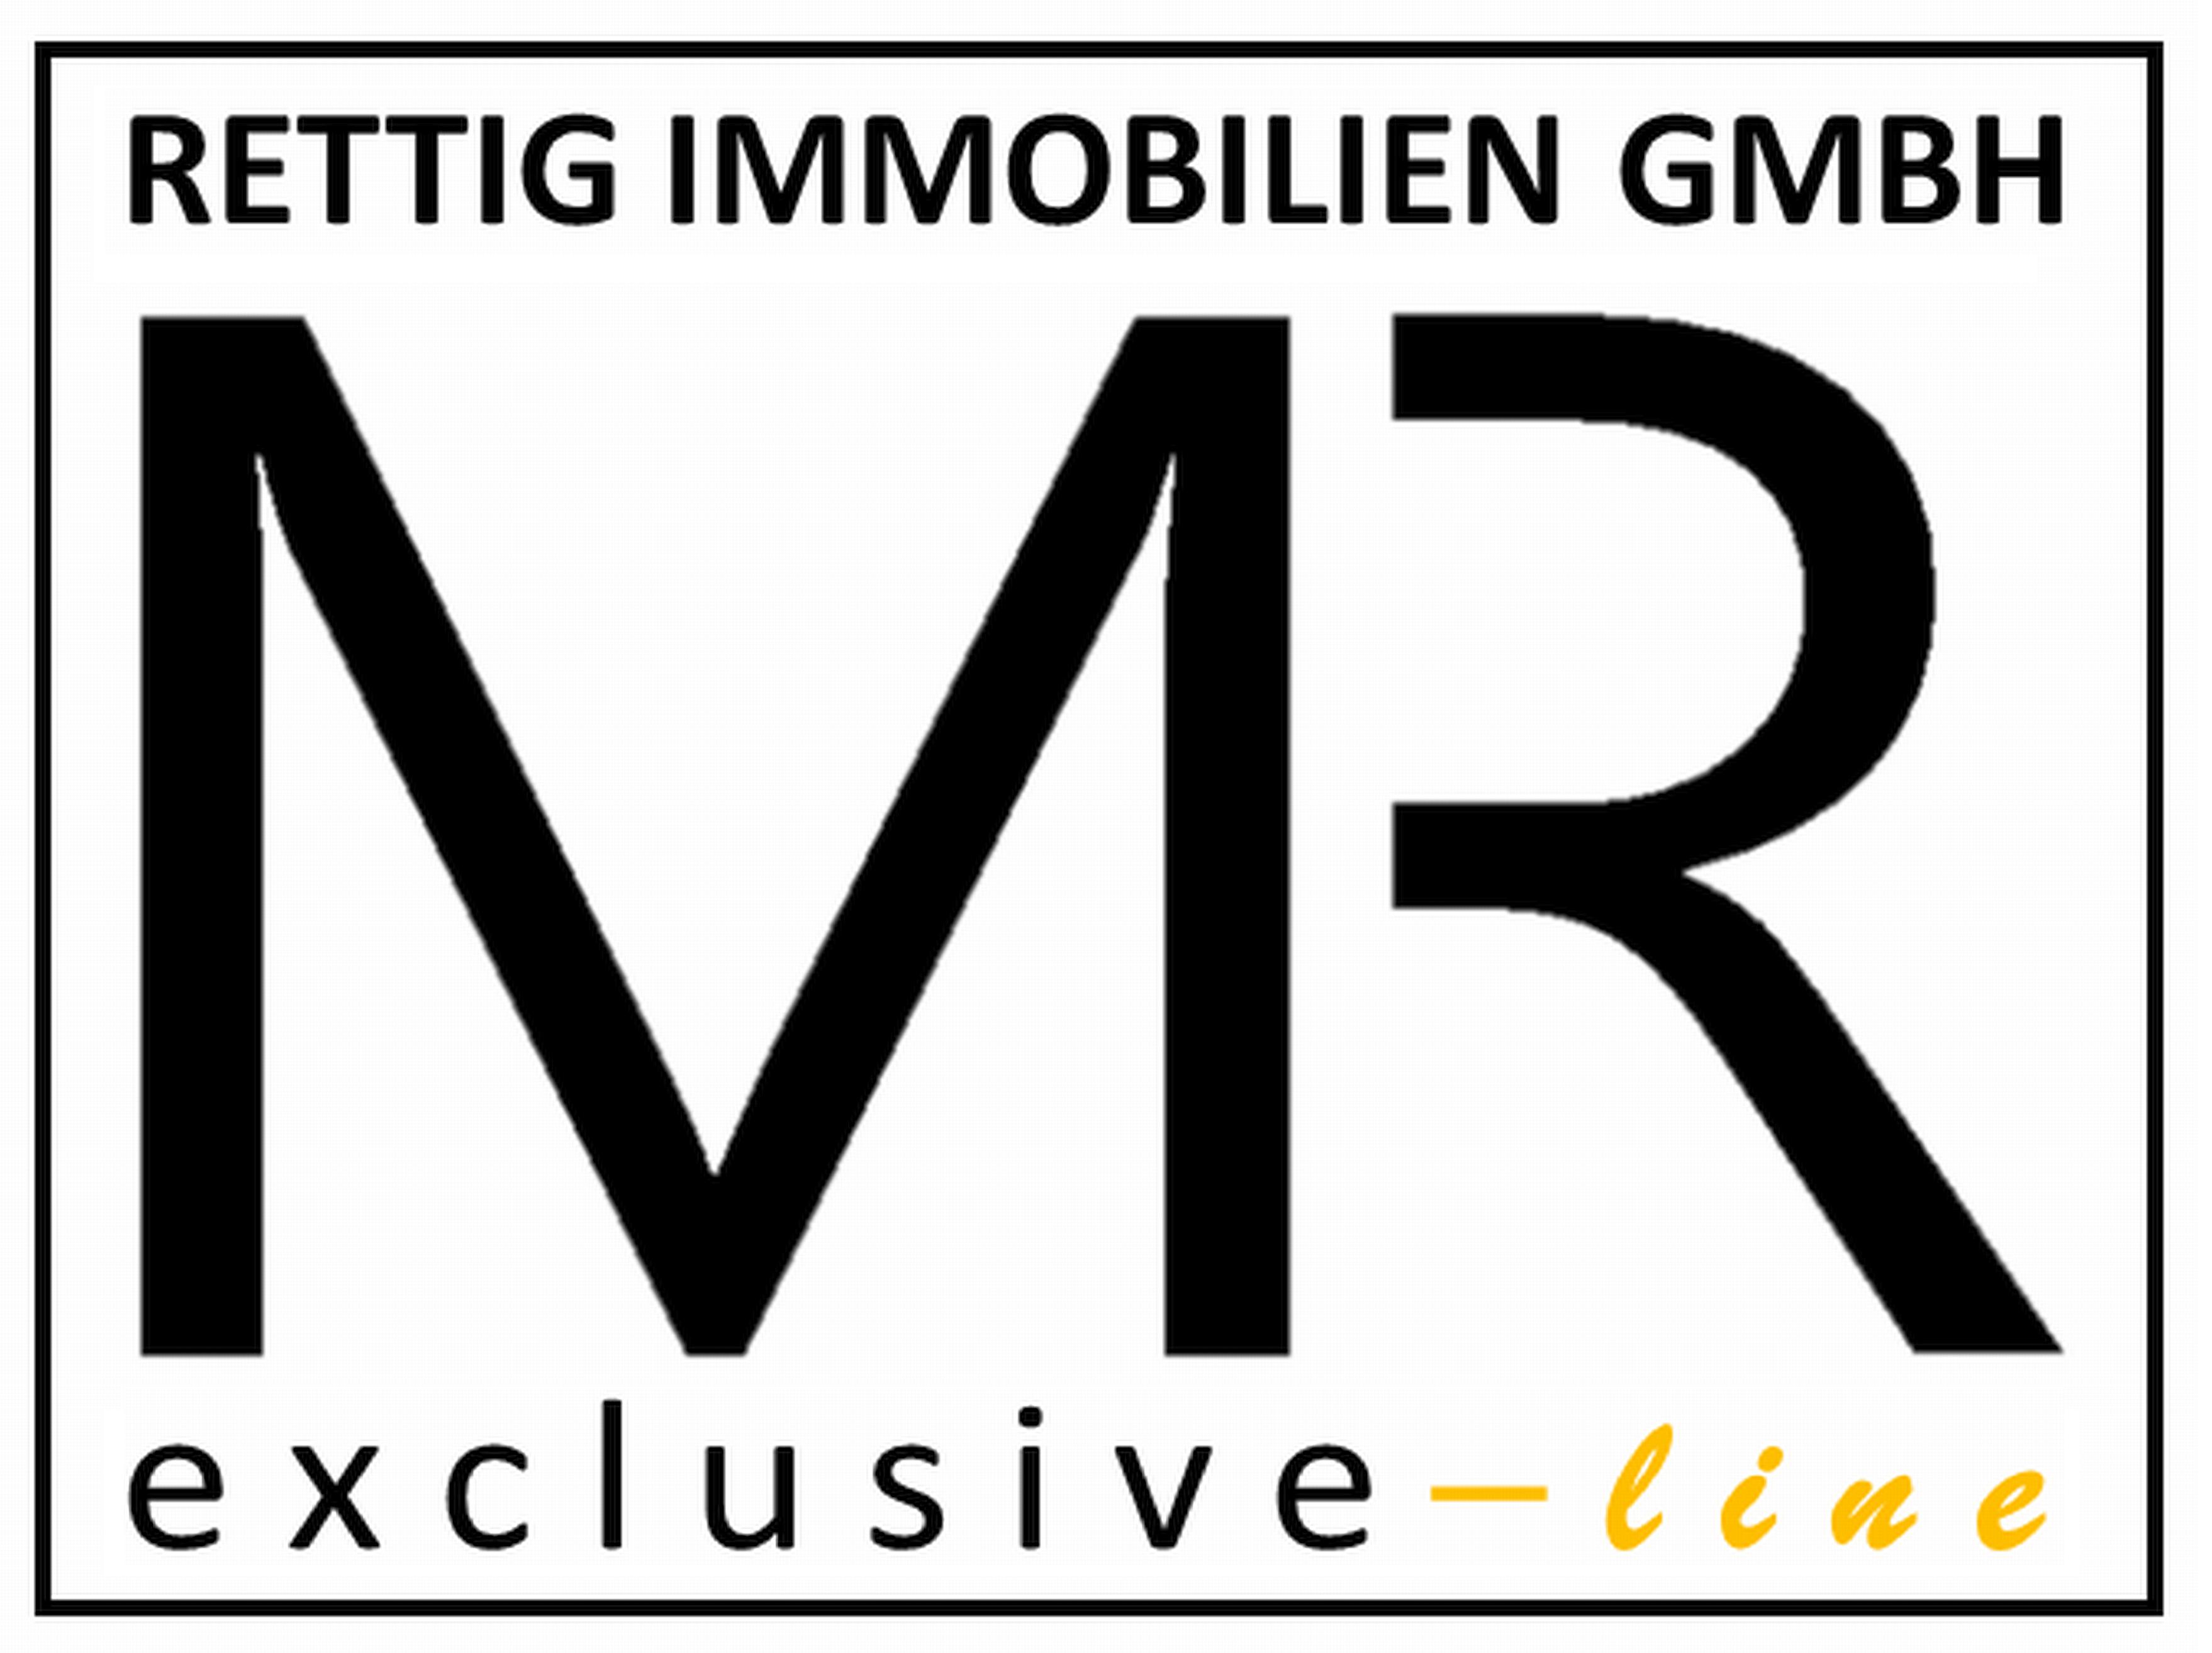 RETTIG IMMOBILIEN GmbH